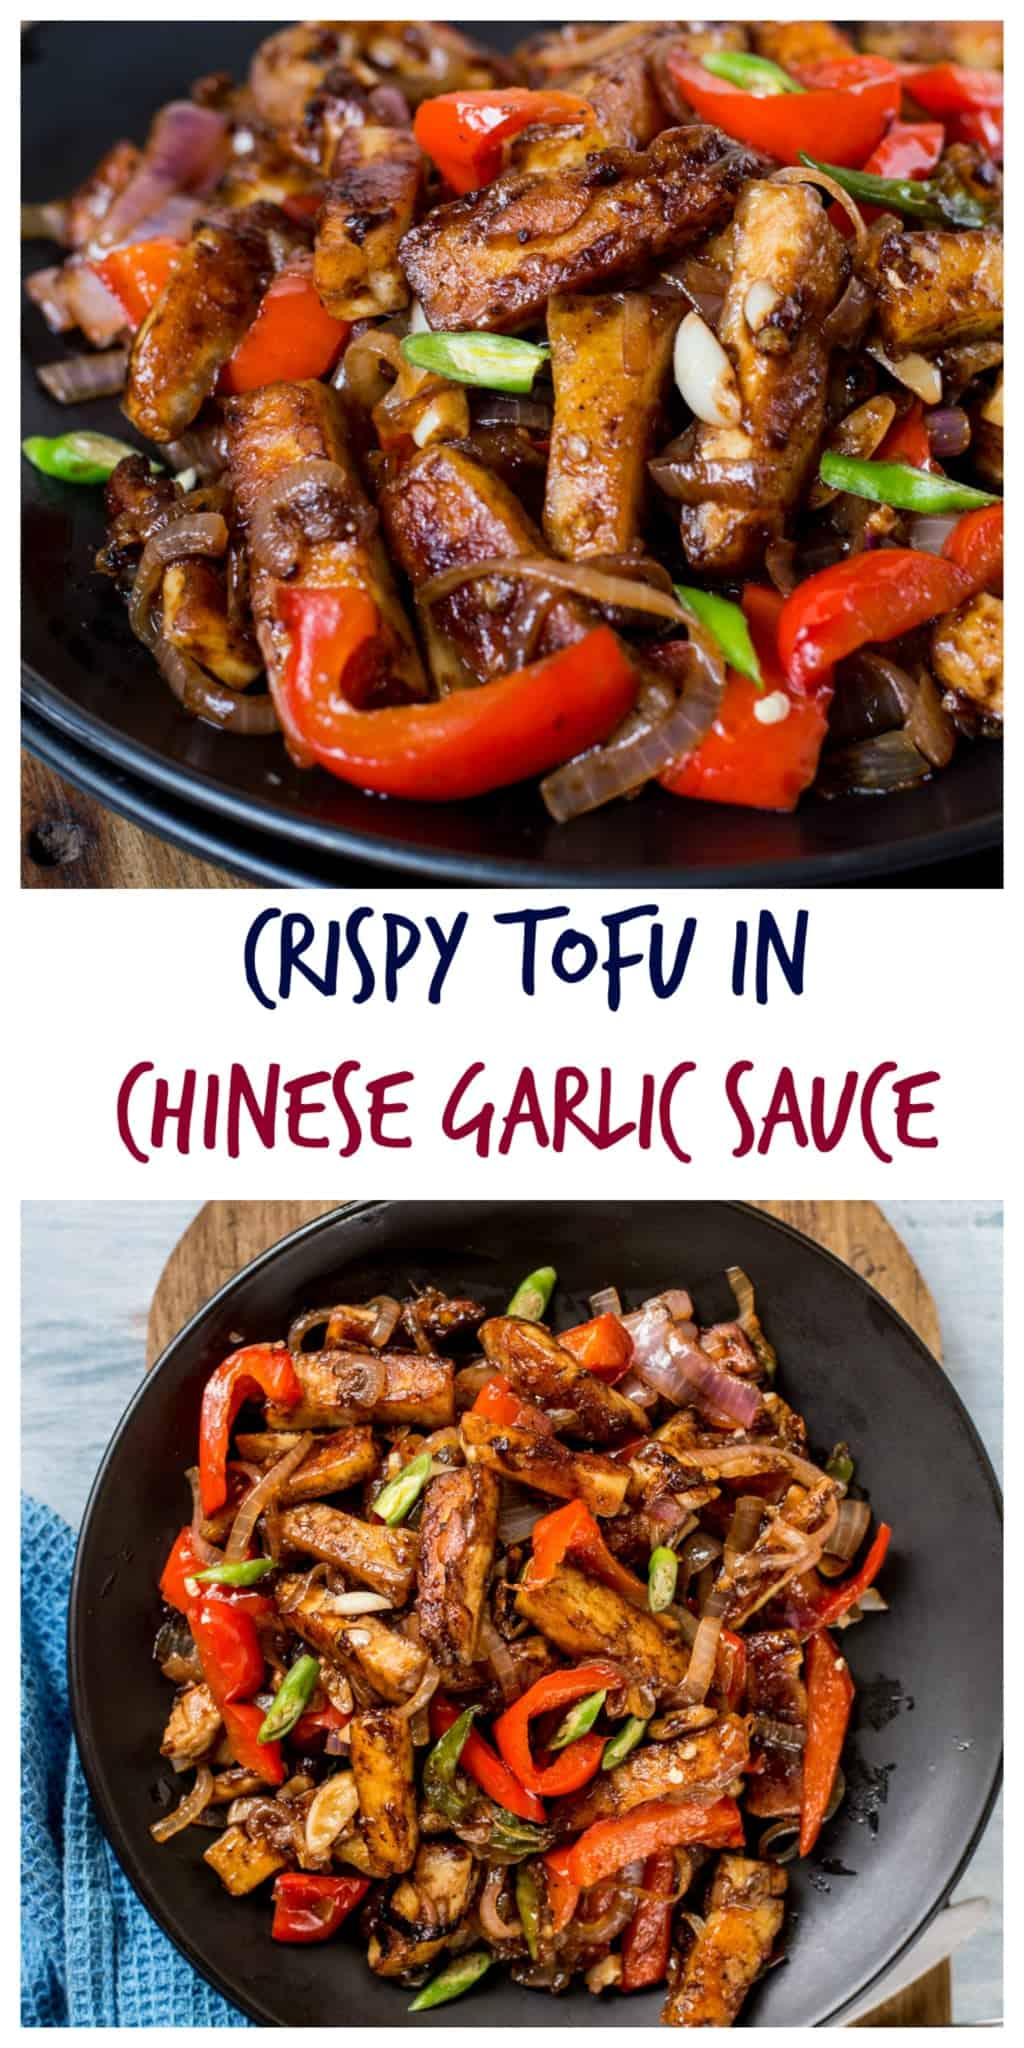 Crispy tofu in chinese garlic sauce crispy tofu in chinese garlic sauce step by step recipe video forumfinder Images